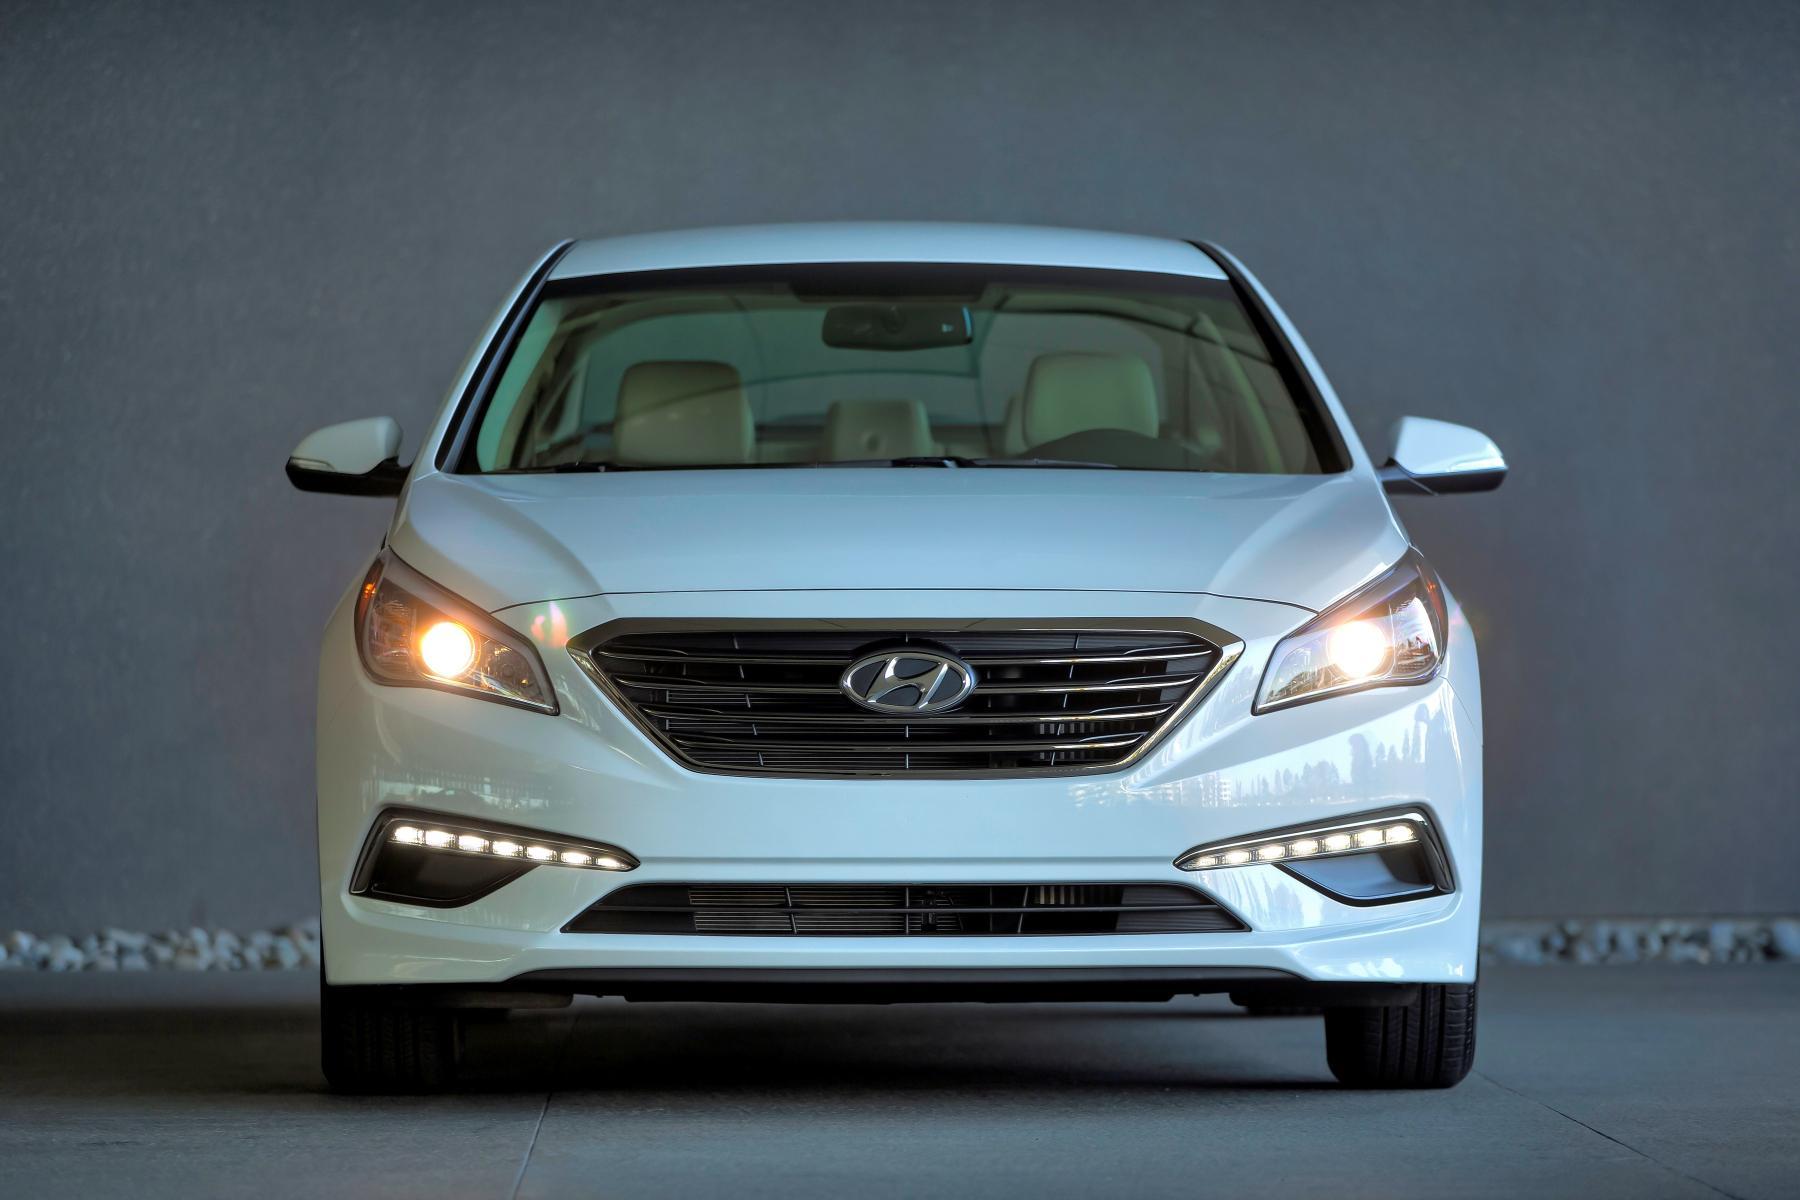 Hyundai Sonata Eco Returns 38 MPG Highway - autoevolution